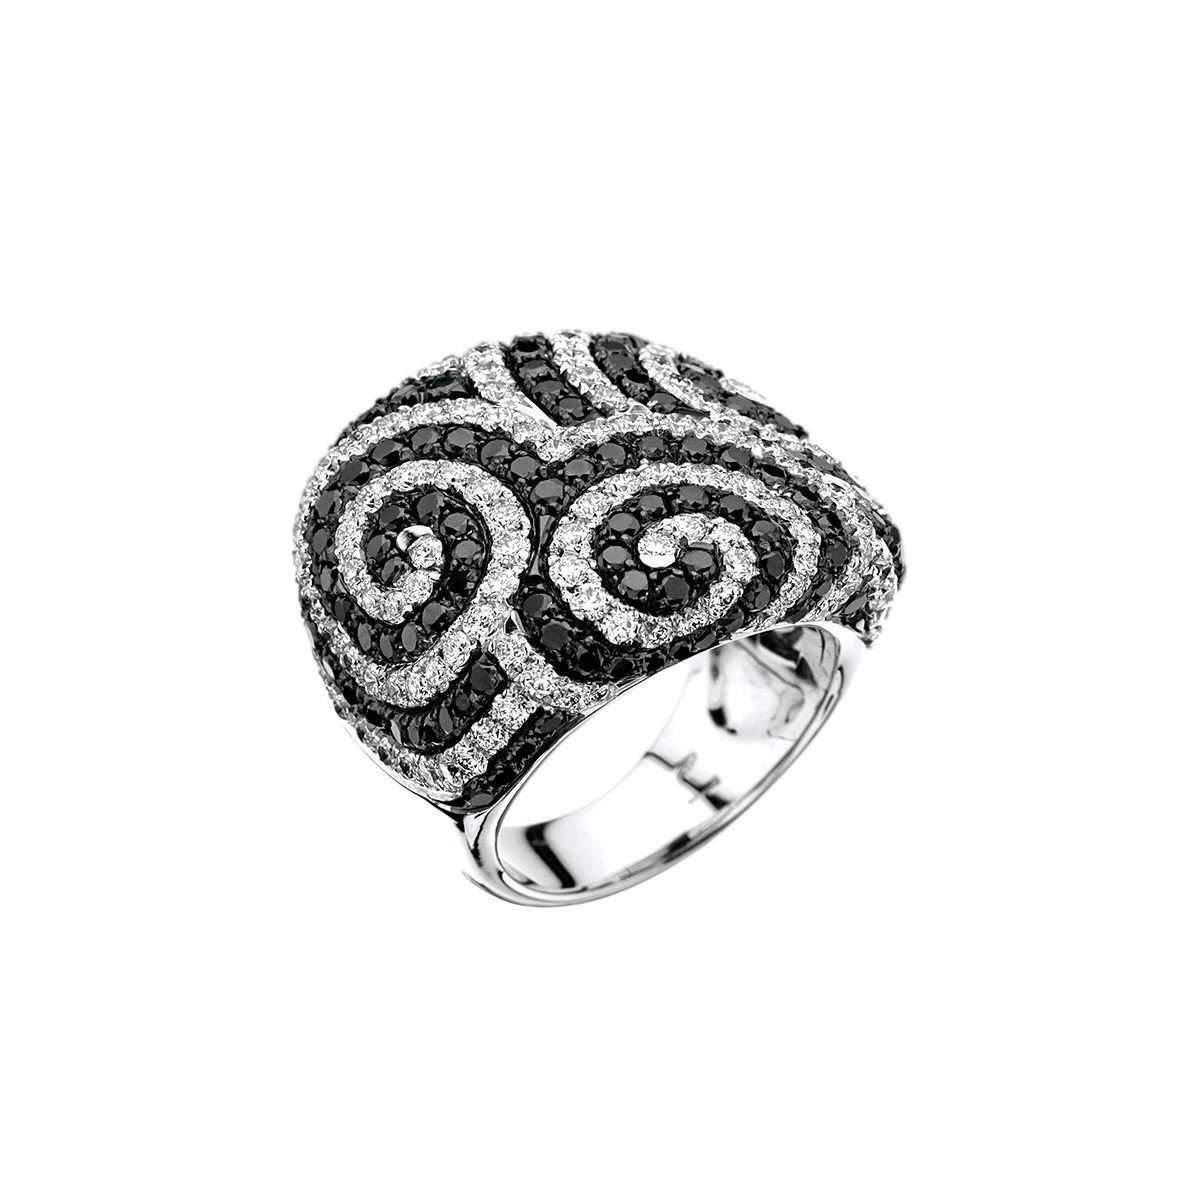 MyriamSOS Twisted Eternity Ring - UK K 1/2 - US 5 3/8 - EU 50 3/4 KPBOT21Xl